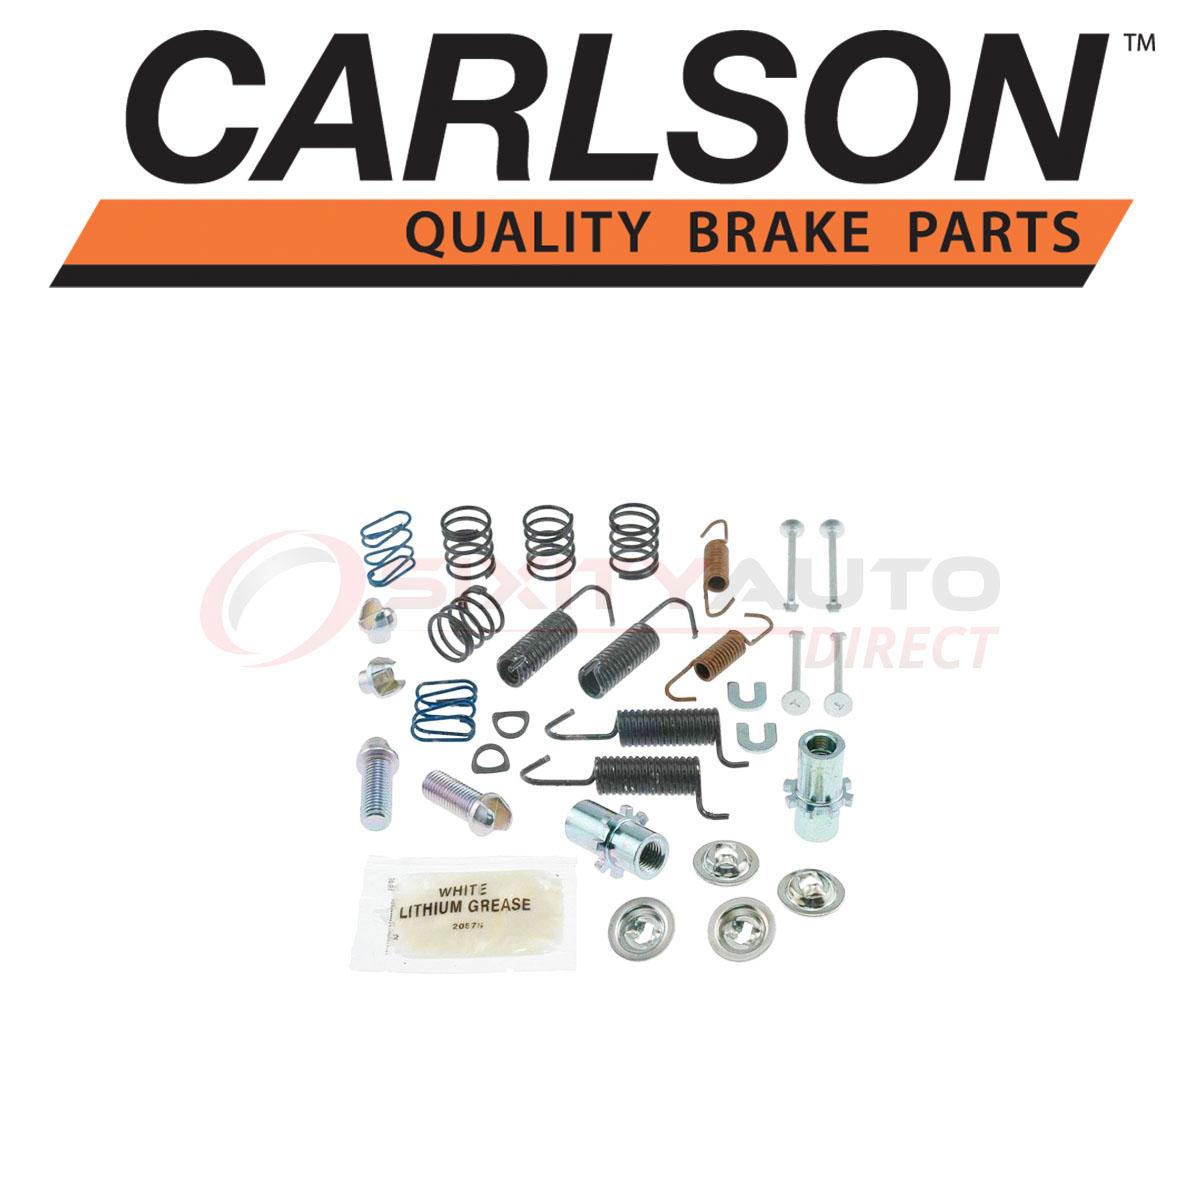 Carlson 17447 Parking Brake Component